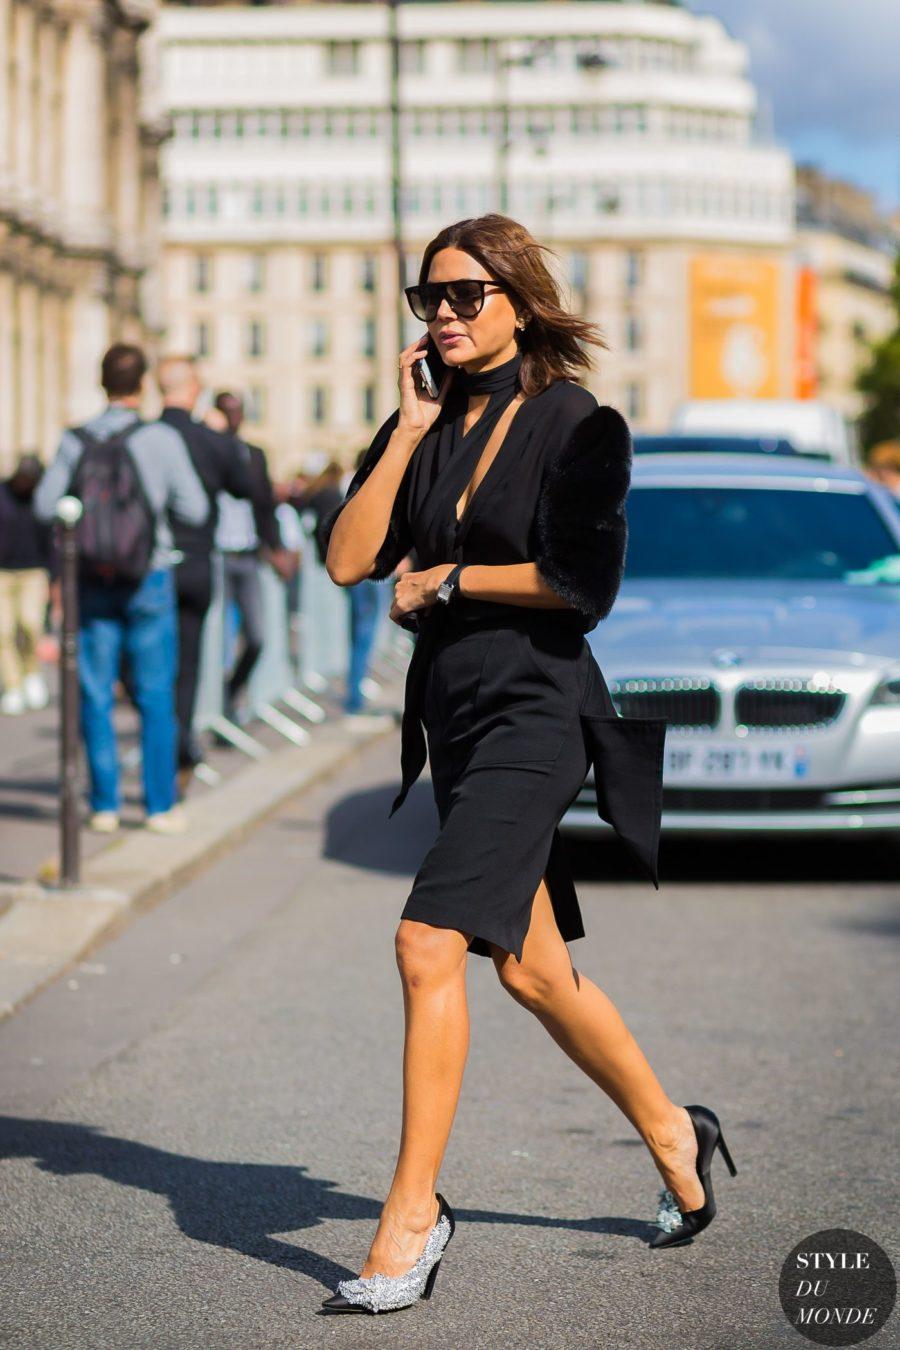 7 Ways to Look More Powerful - christine centenera street style, power dressing // Notjessfashion.com